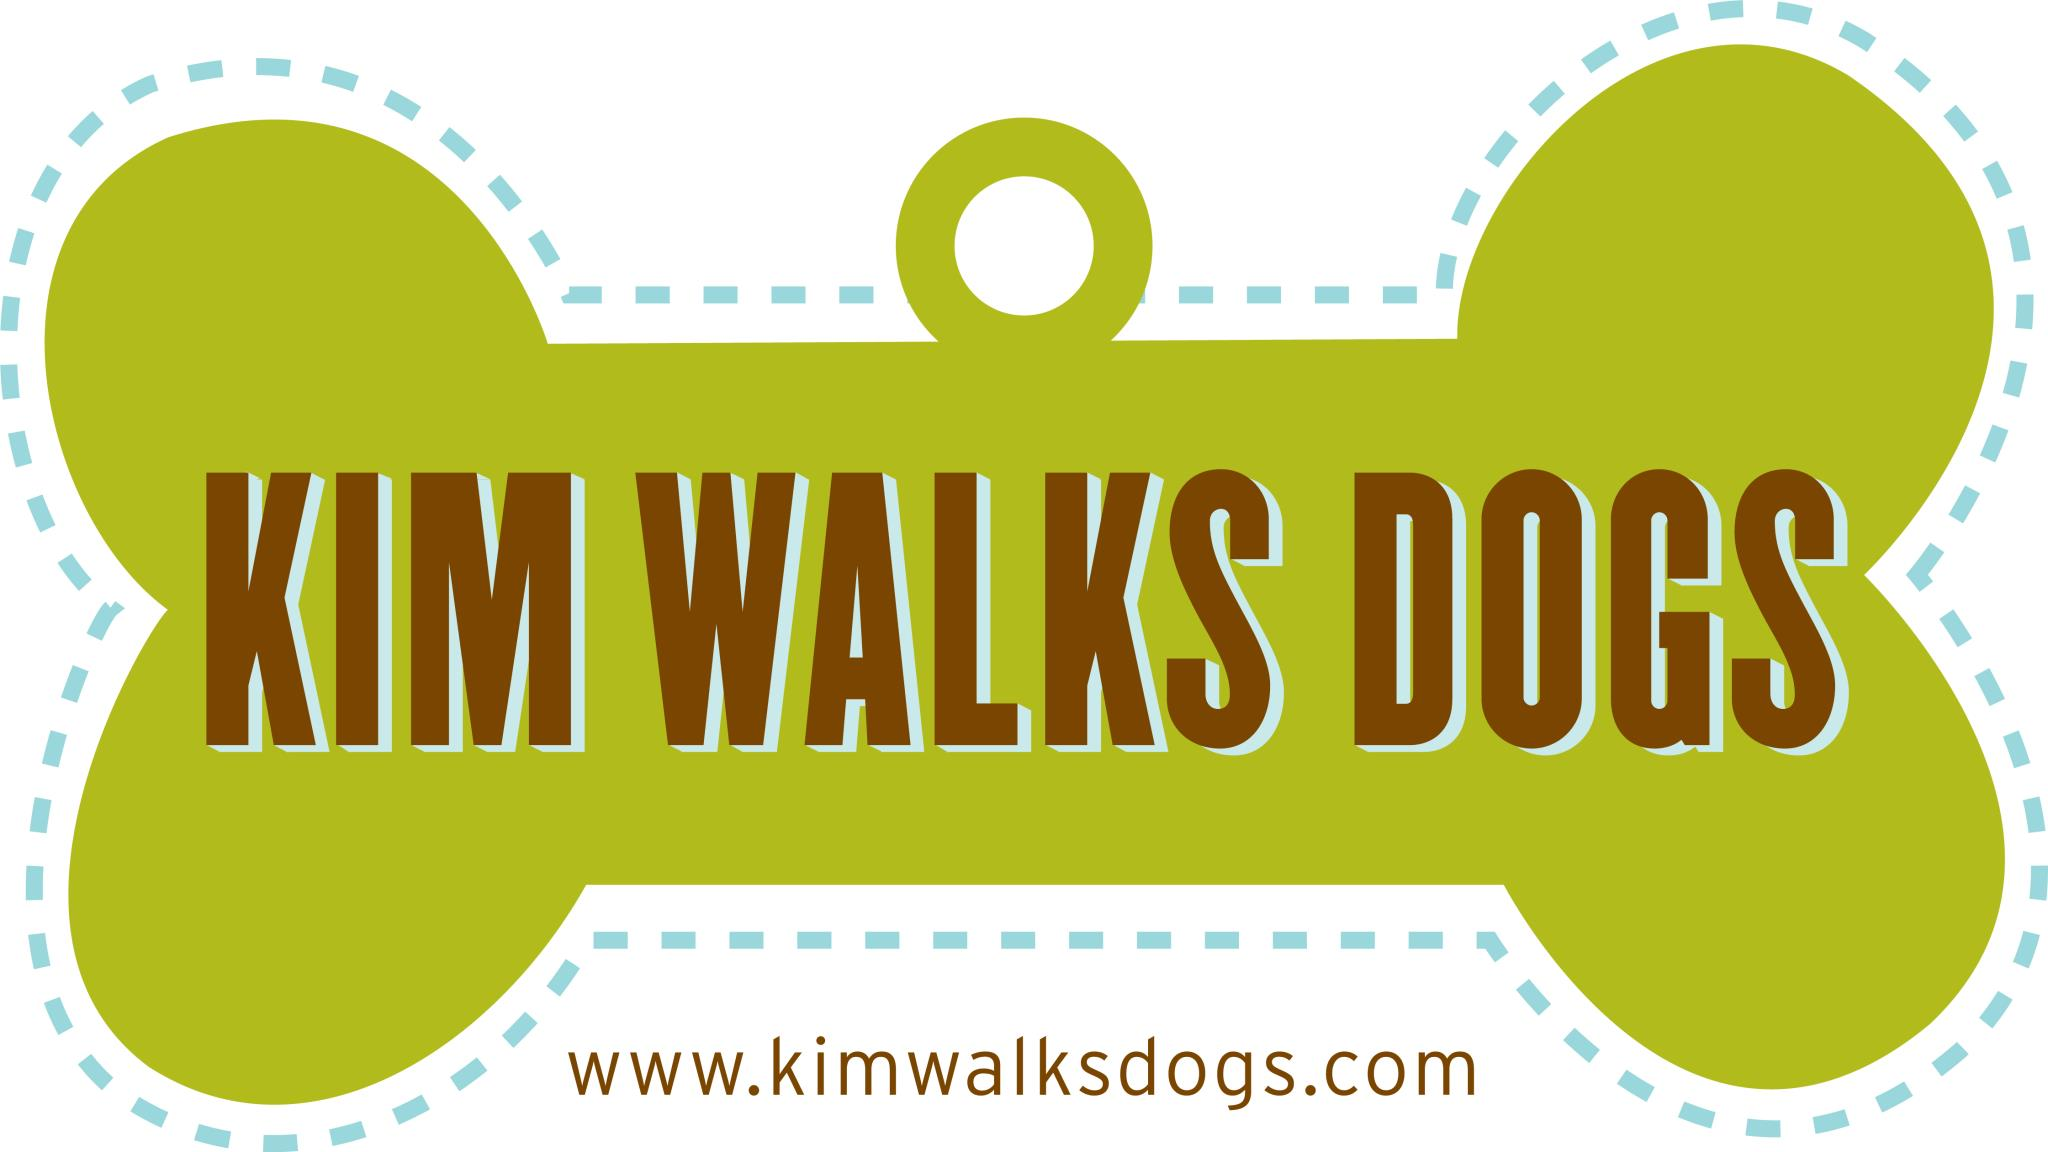 Kim Walks Dogs